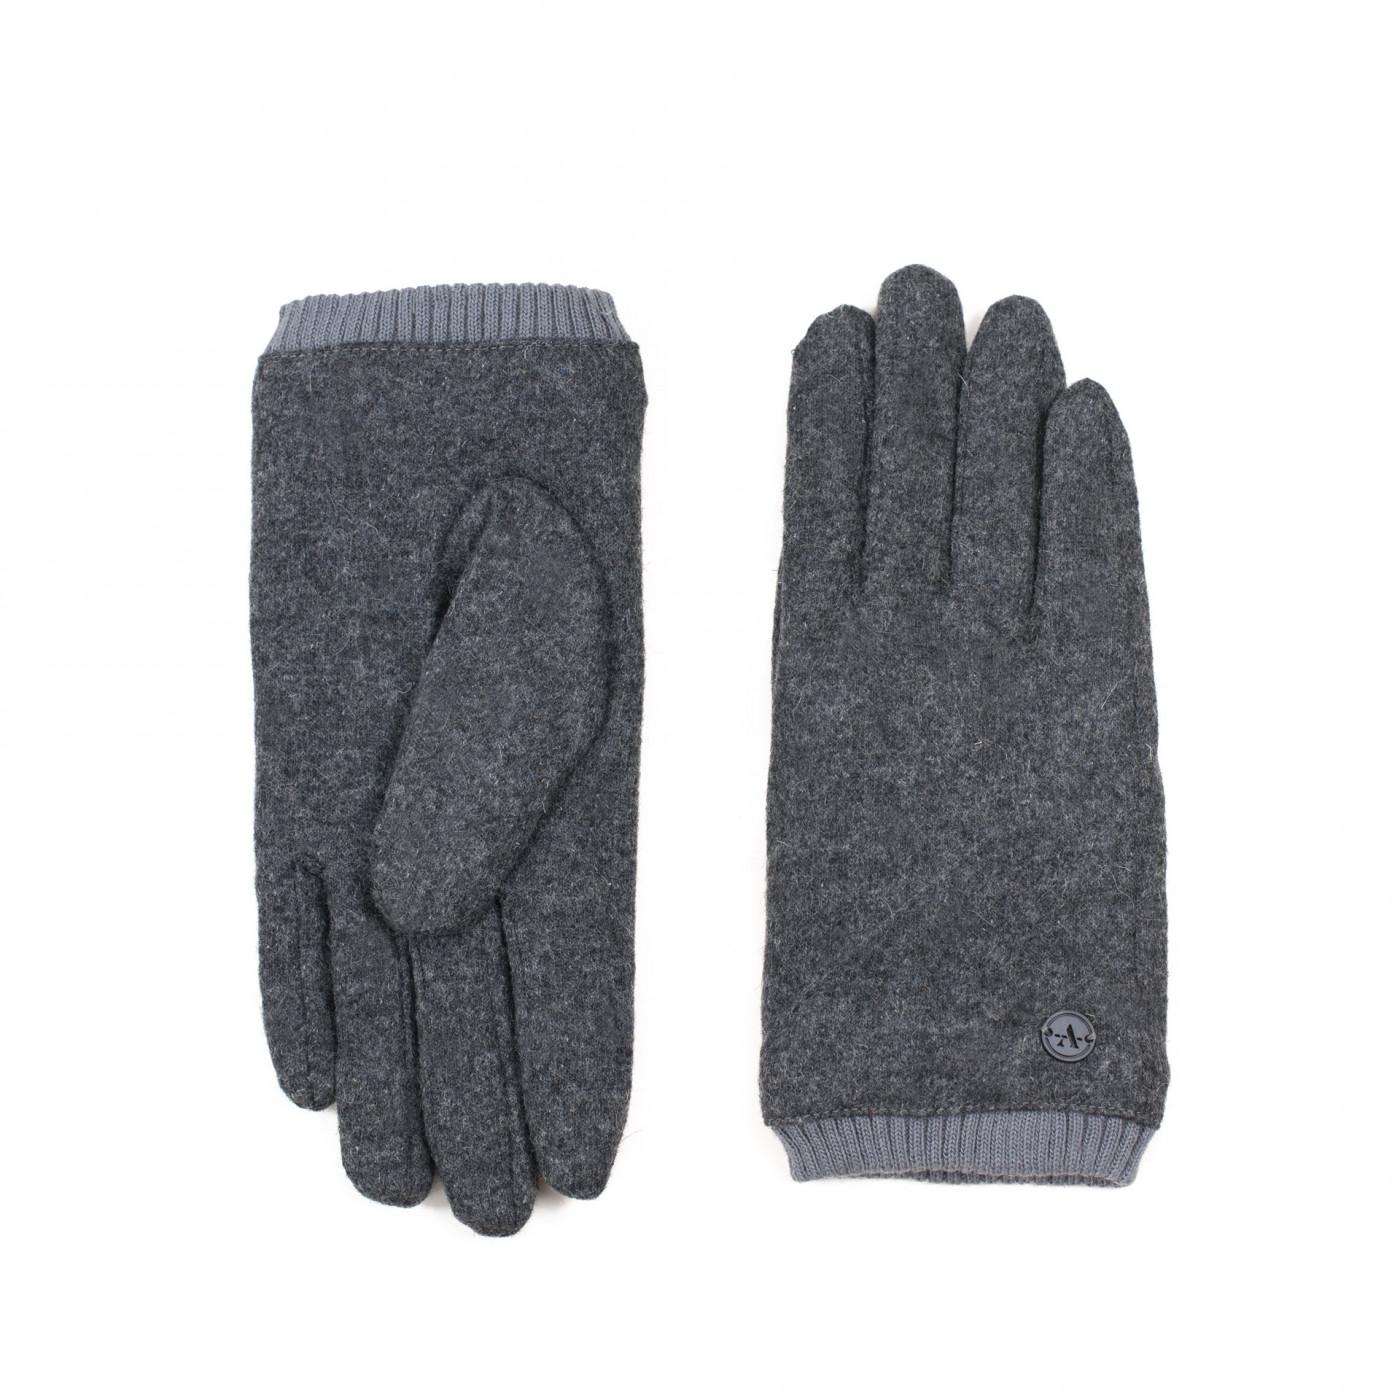 Art Of Polo Man's Gloves rk18357